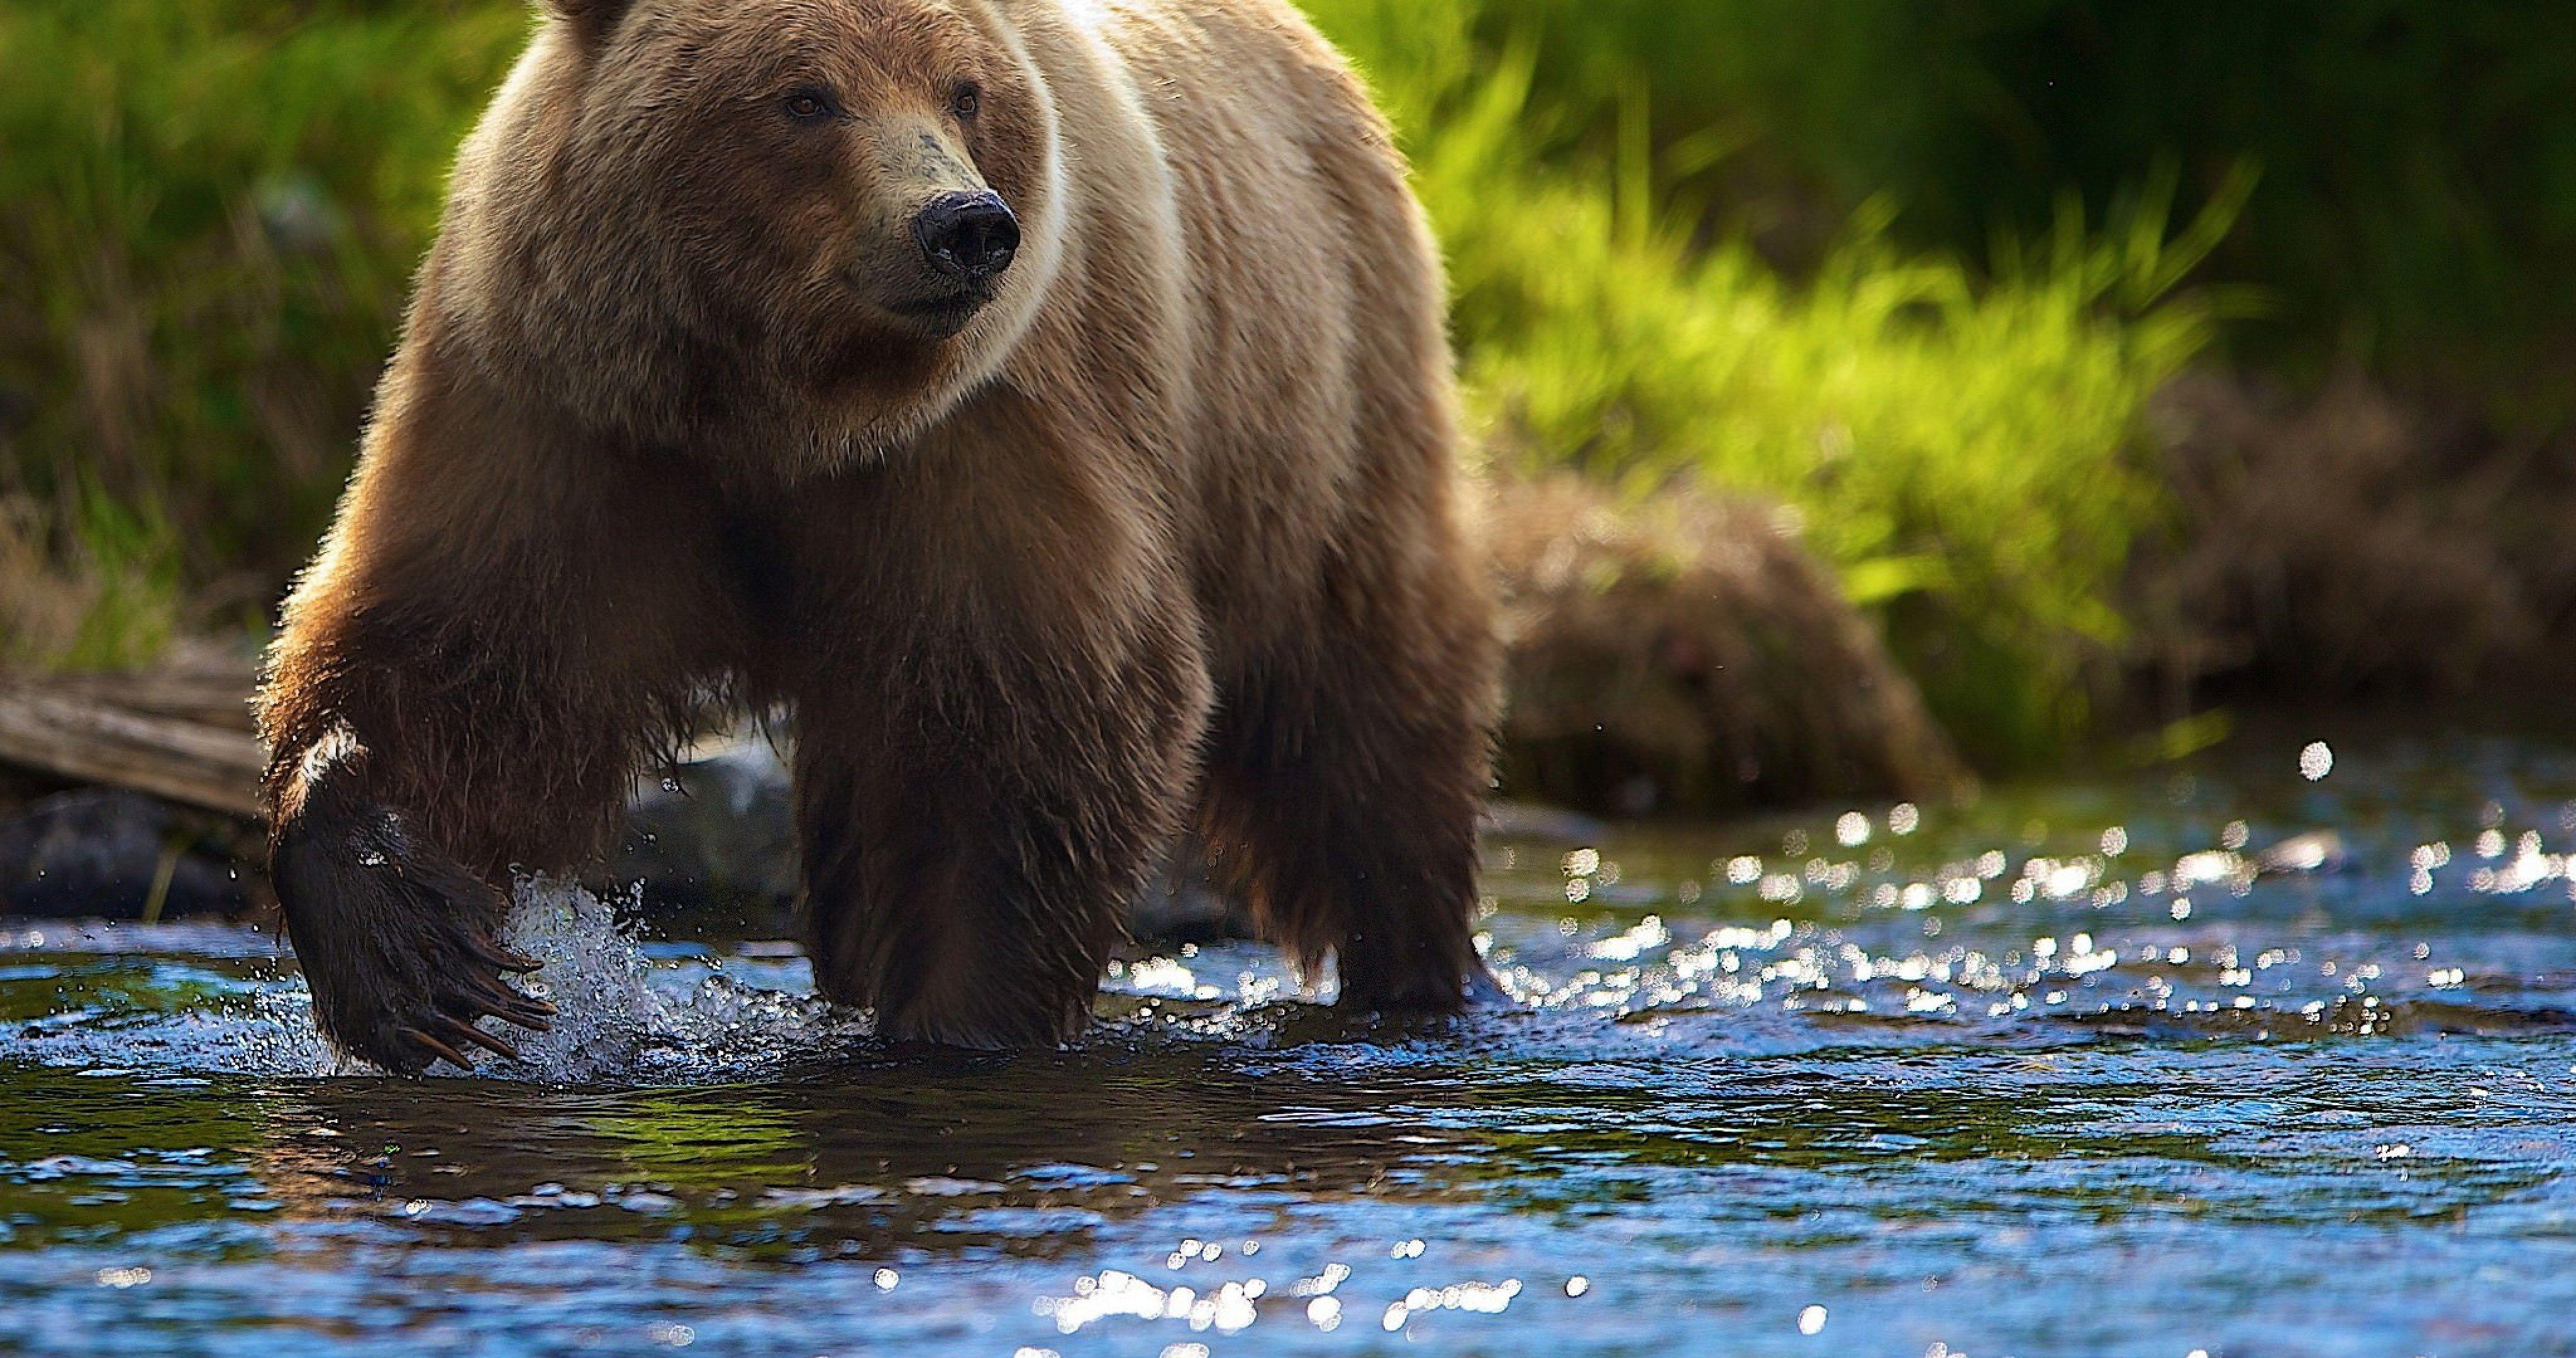 summer bear in river 4k ultra hd wallpaper Animales y